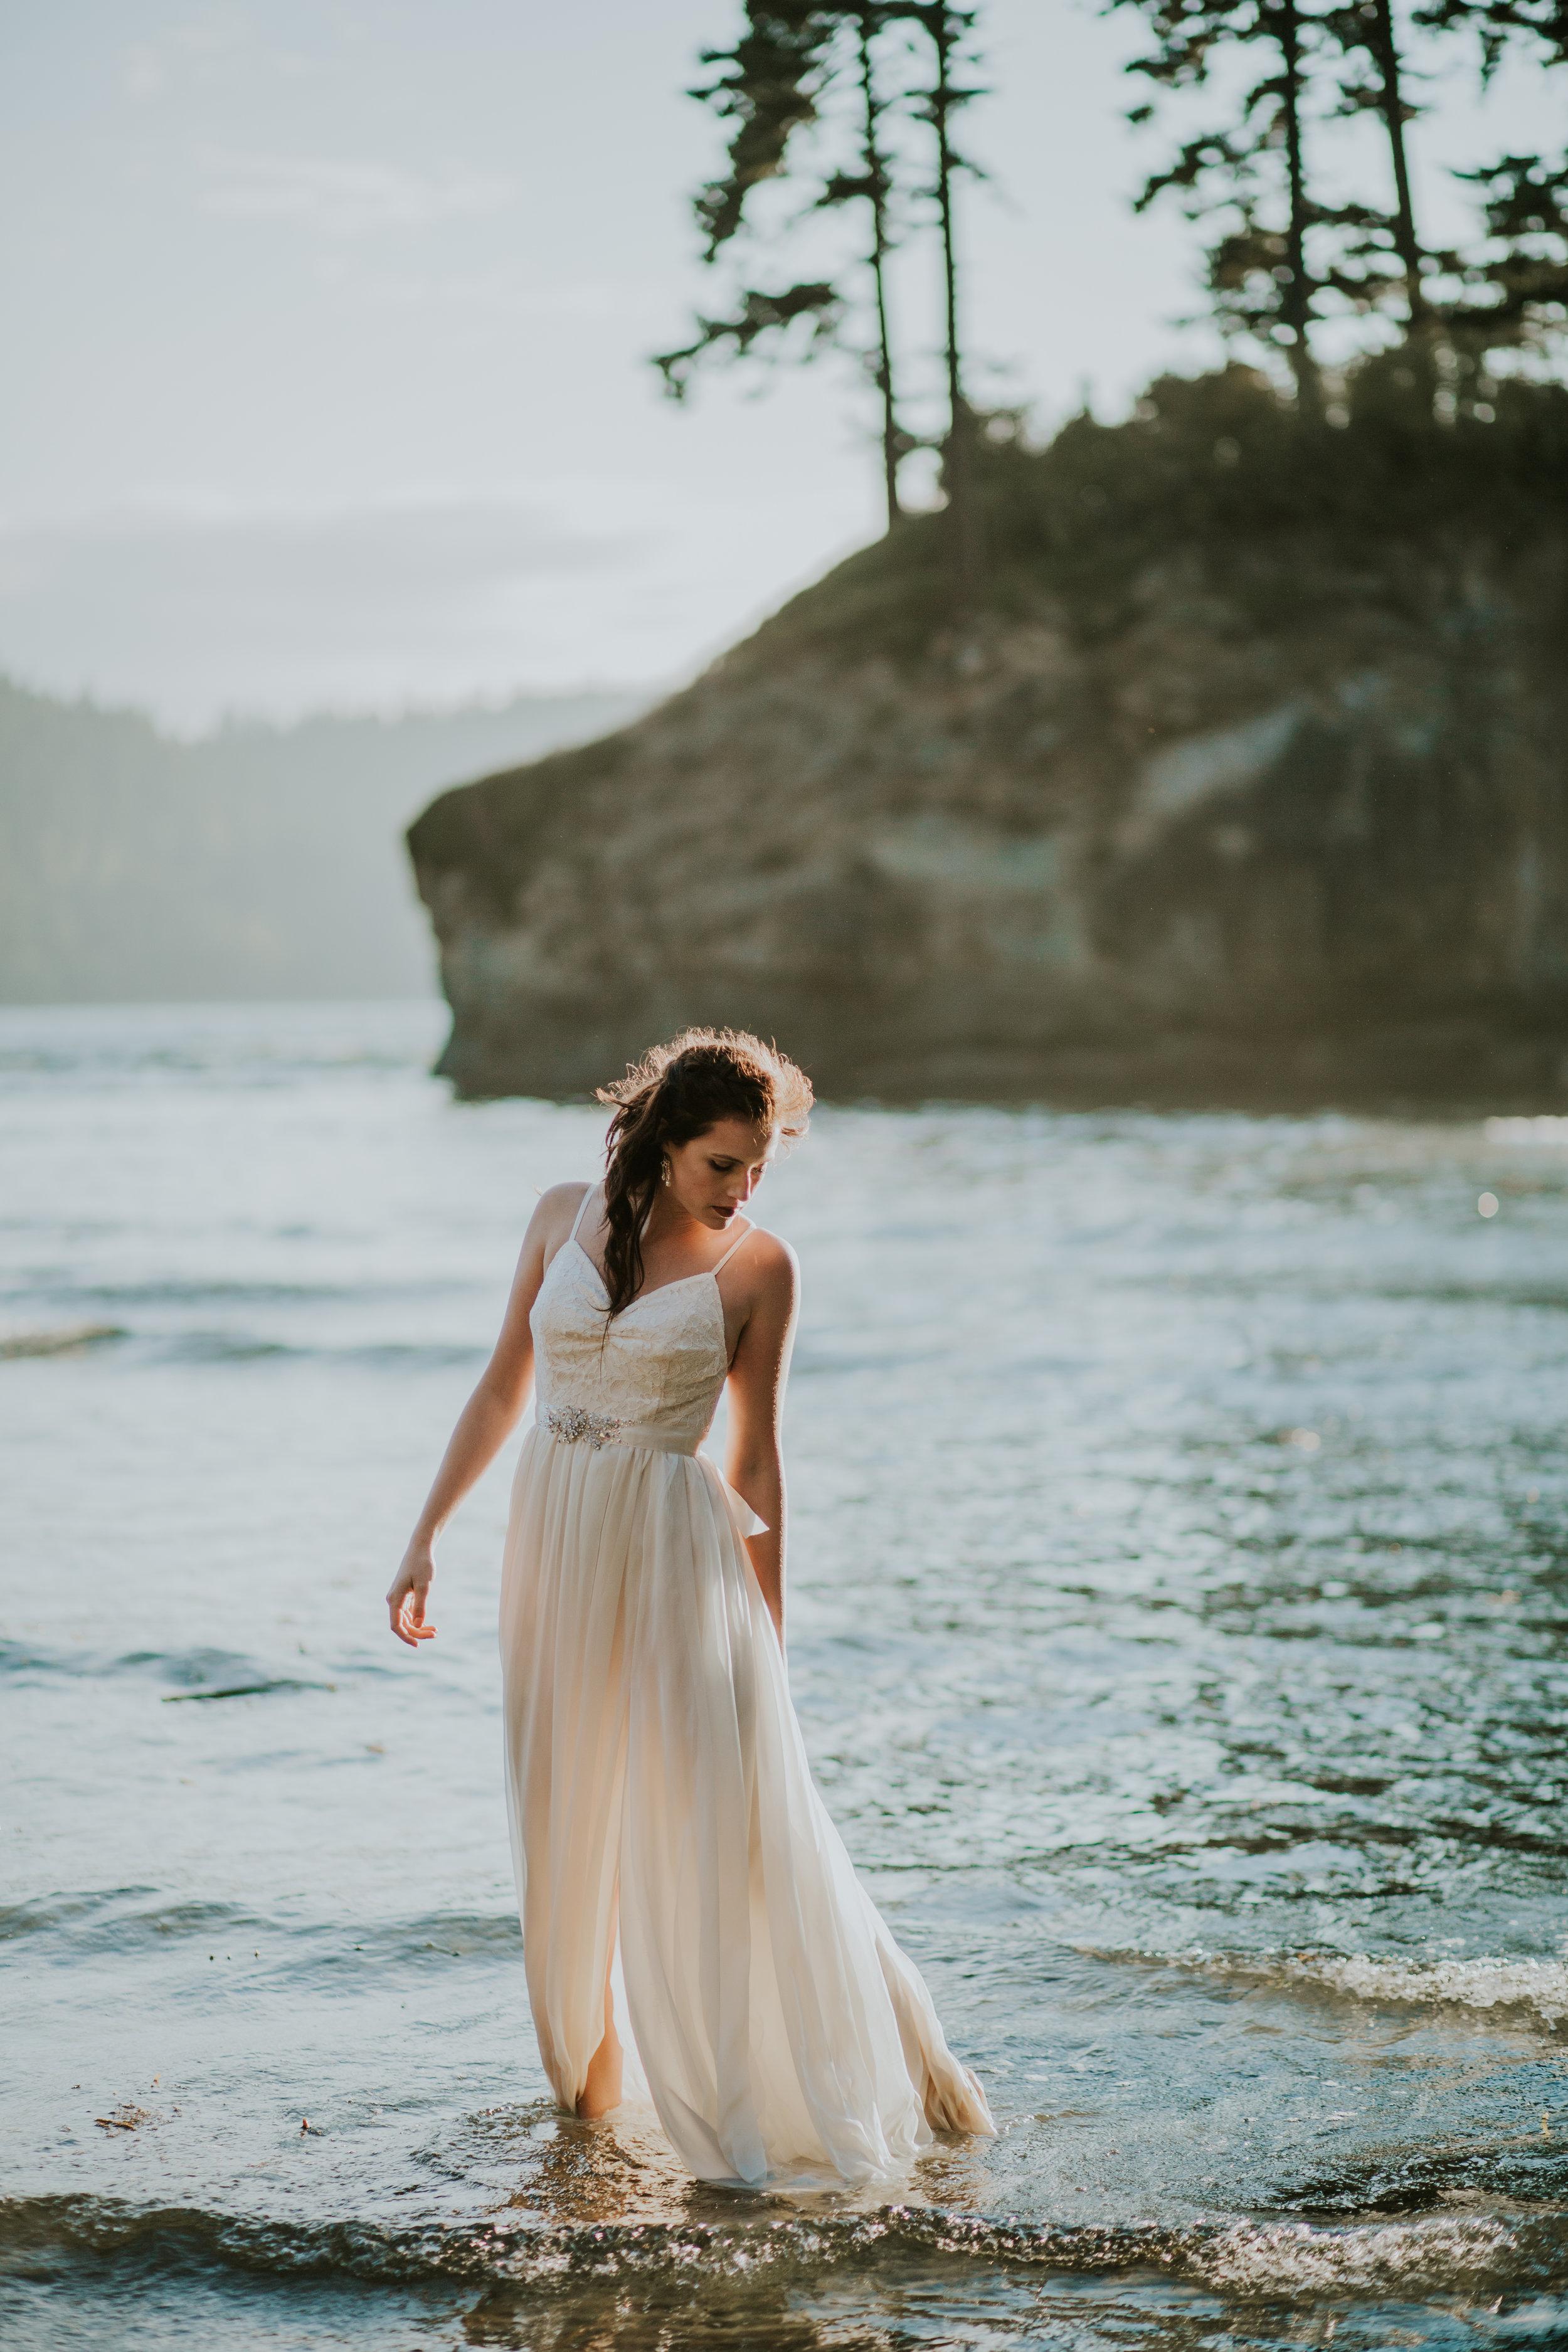 Port-Angeles-Salt-Creek-beach-wedding-bride-PNW-olympic-peninsula-photographer-Kayla-Dawn-Photography-outdoors-golden-hour-dancer-dress (42).jpg